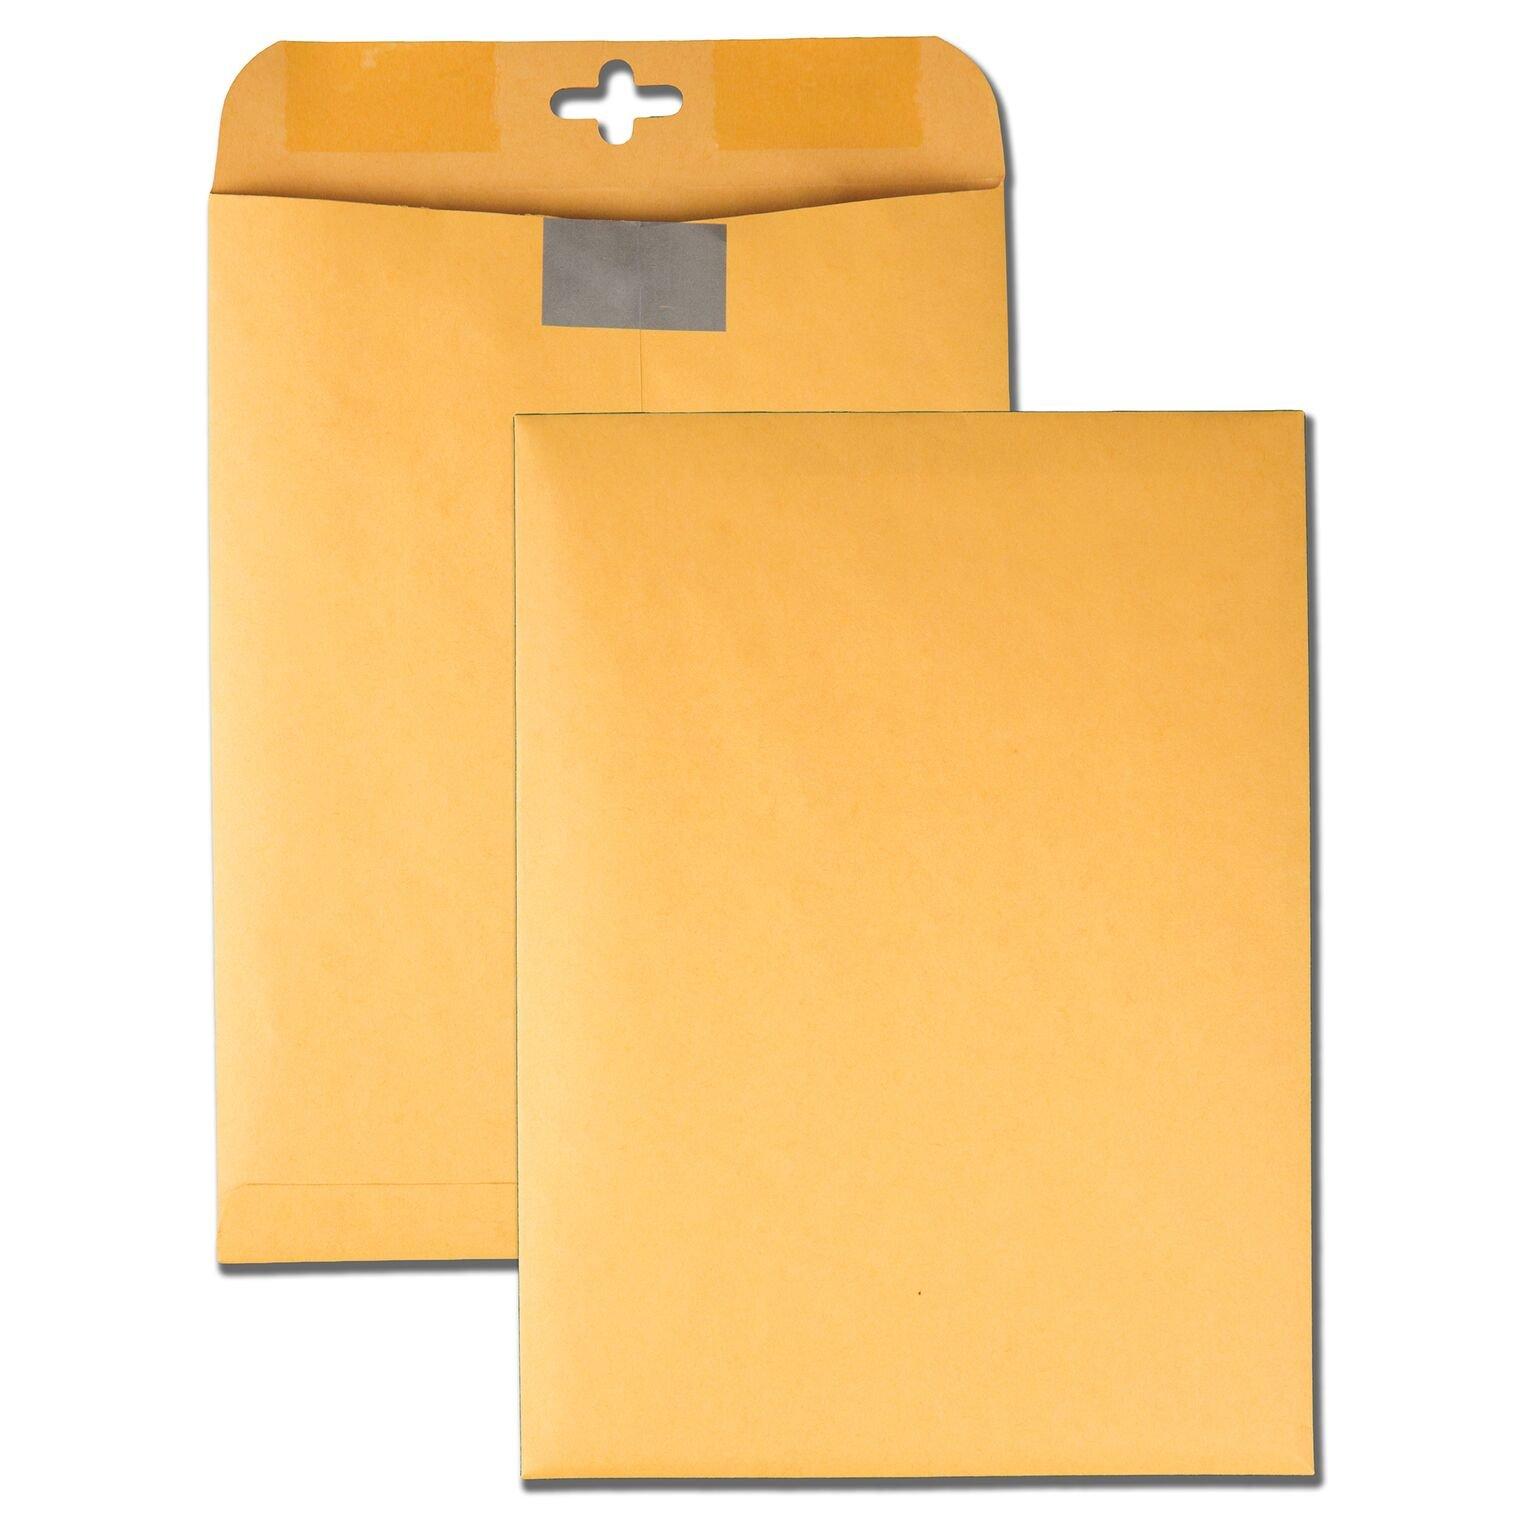 Quality Park Postage Saving ClearClasp Kraft Envelopes, 9 x 12, Brown Kraft, 100/Box (43568)